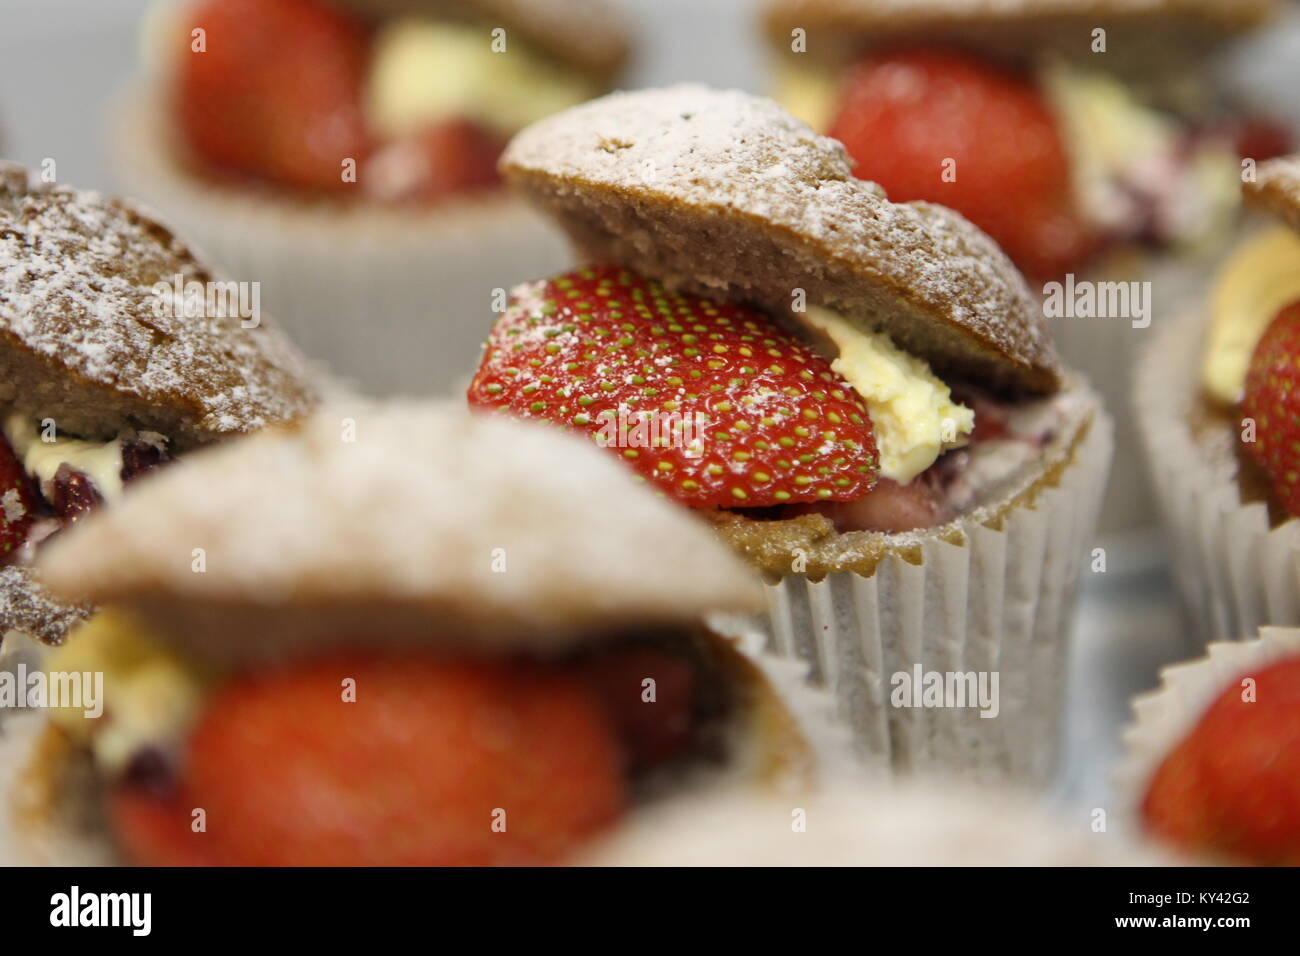 Homemade strawberry and cream cupcakes. - Stock Image